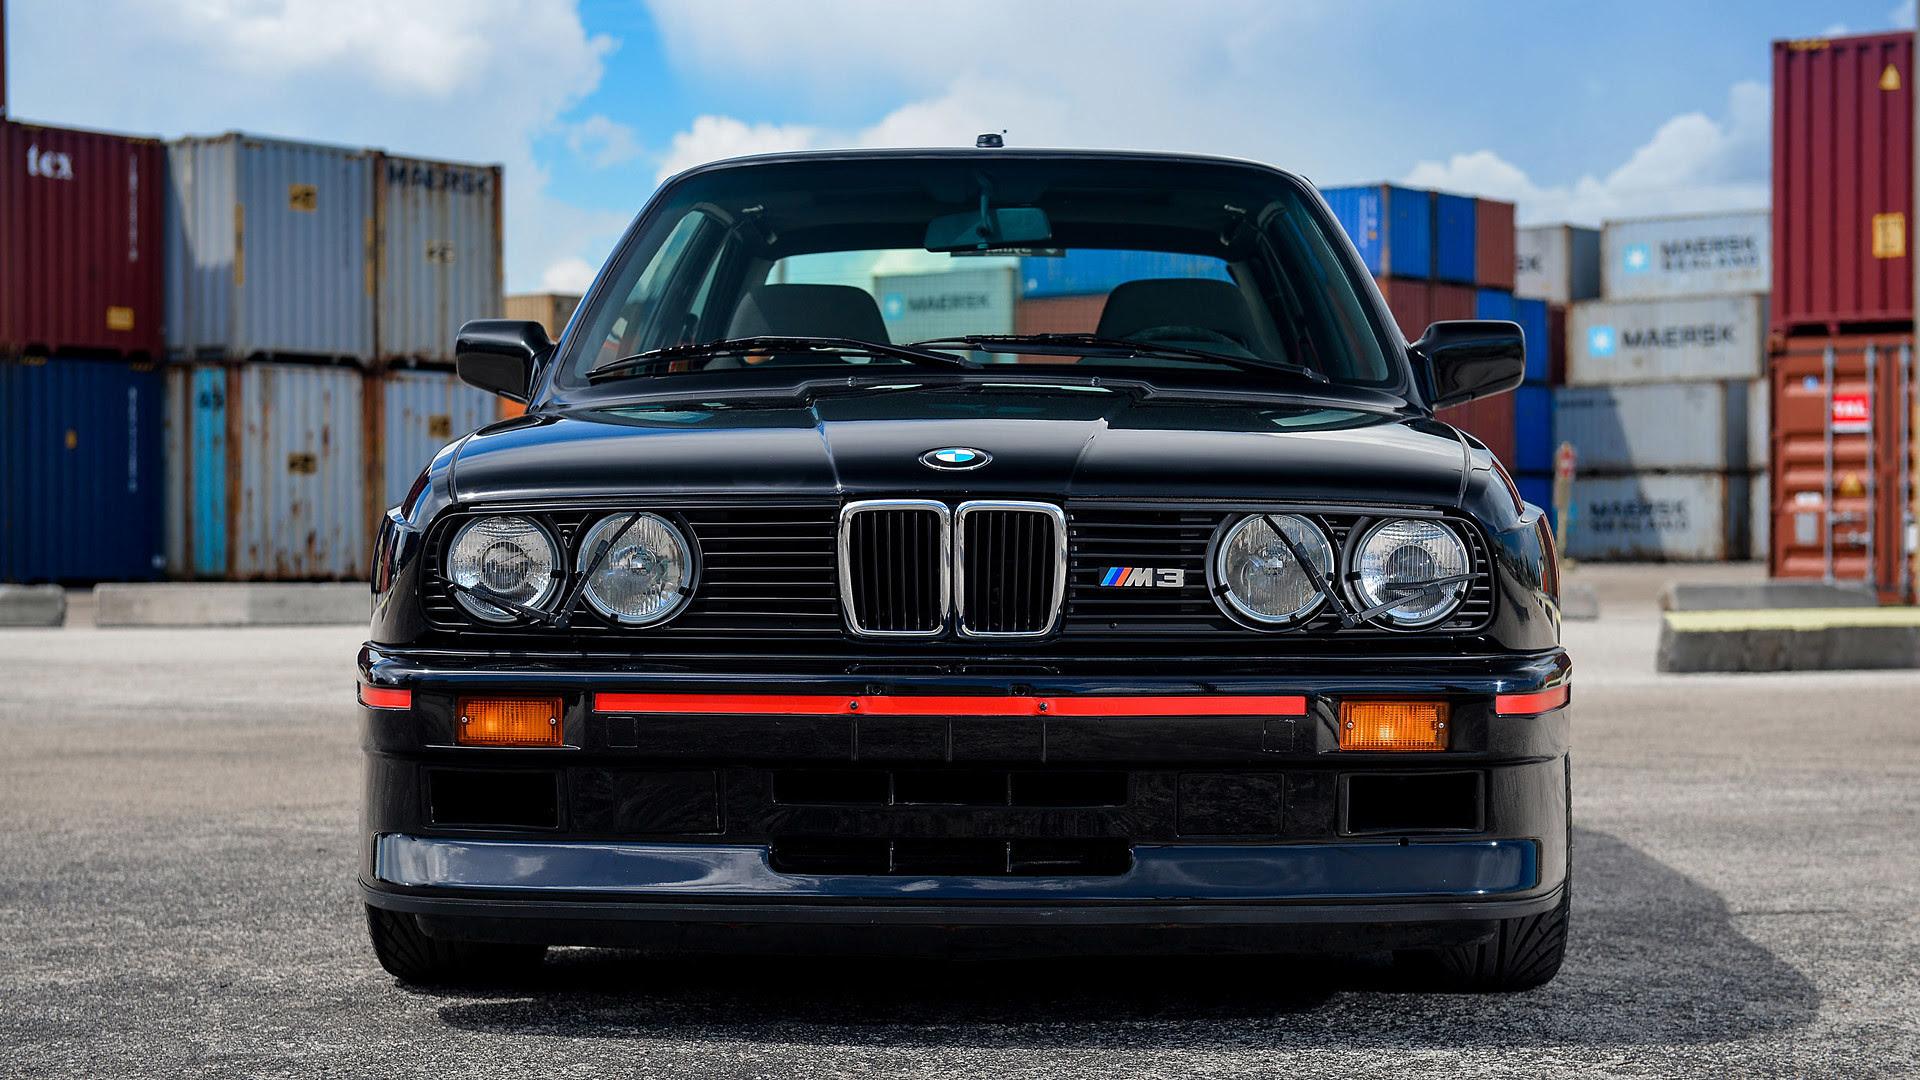 BMW E30 M3 Wallpaper (65+ images)